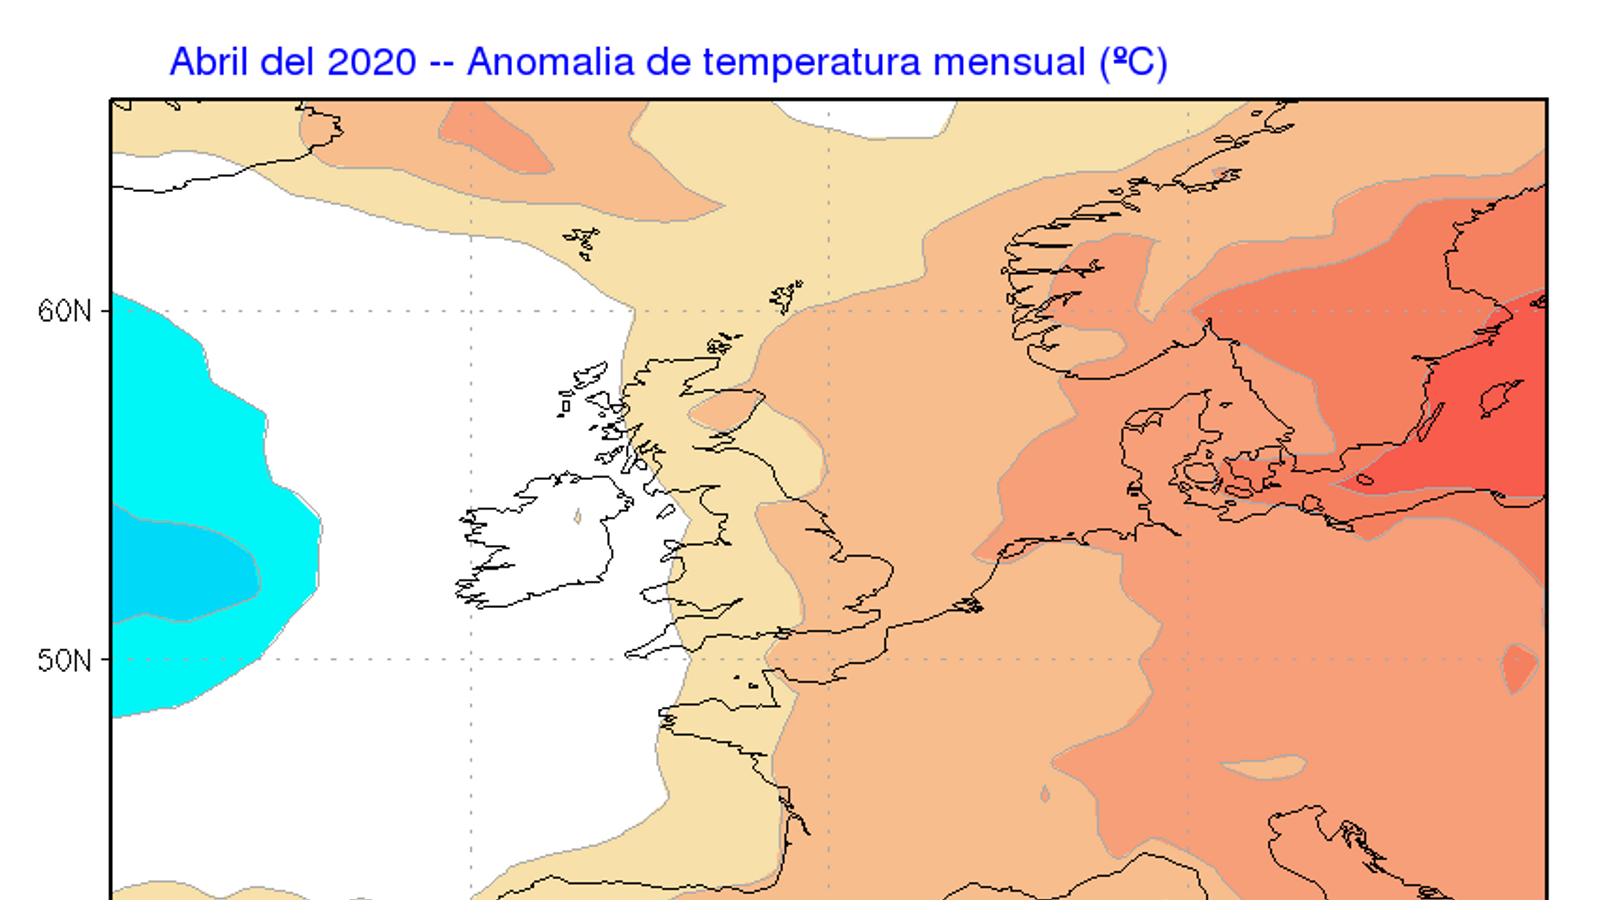 Anomalia de temperatura mensual prevista de cara a l'abril